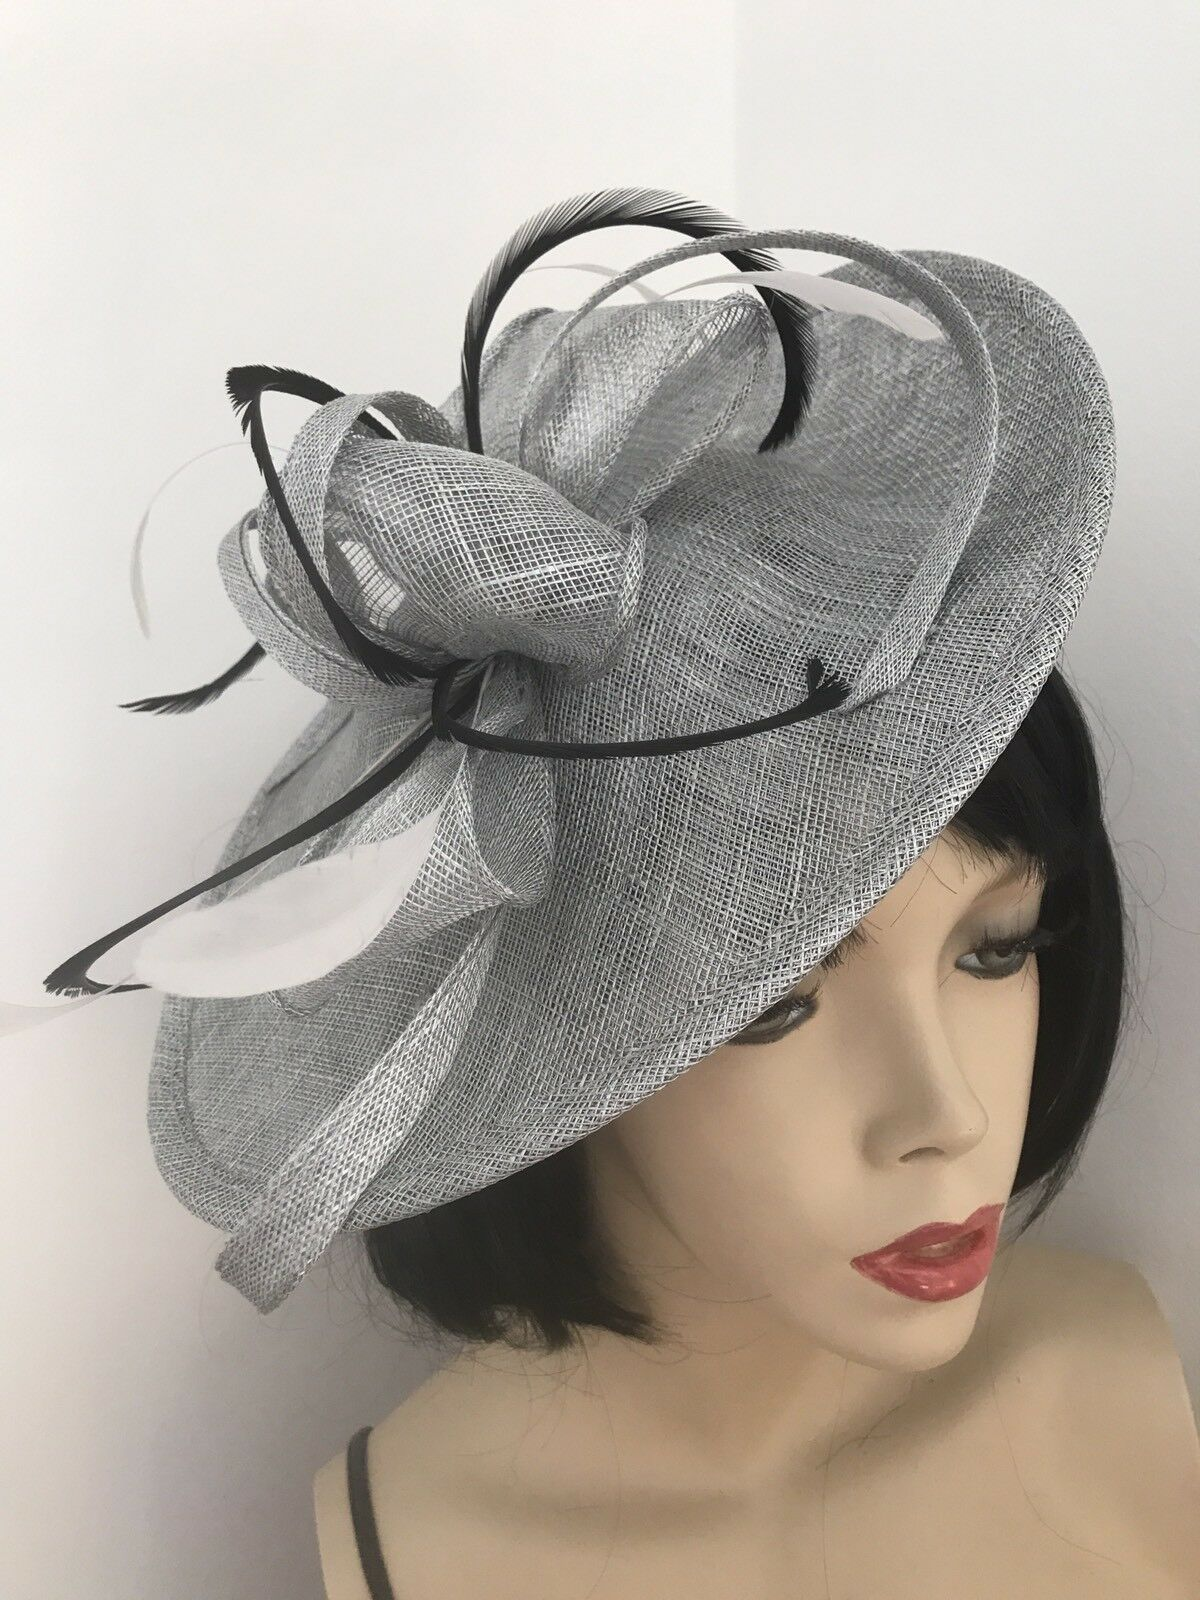 Silver Grey Black Feather Fascinator Saucer Hat Wedding Formal Ladies Races